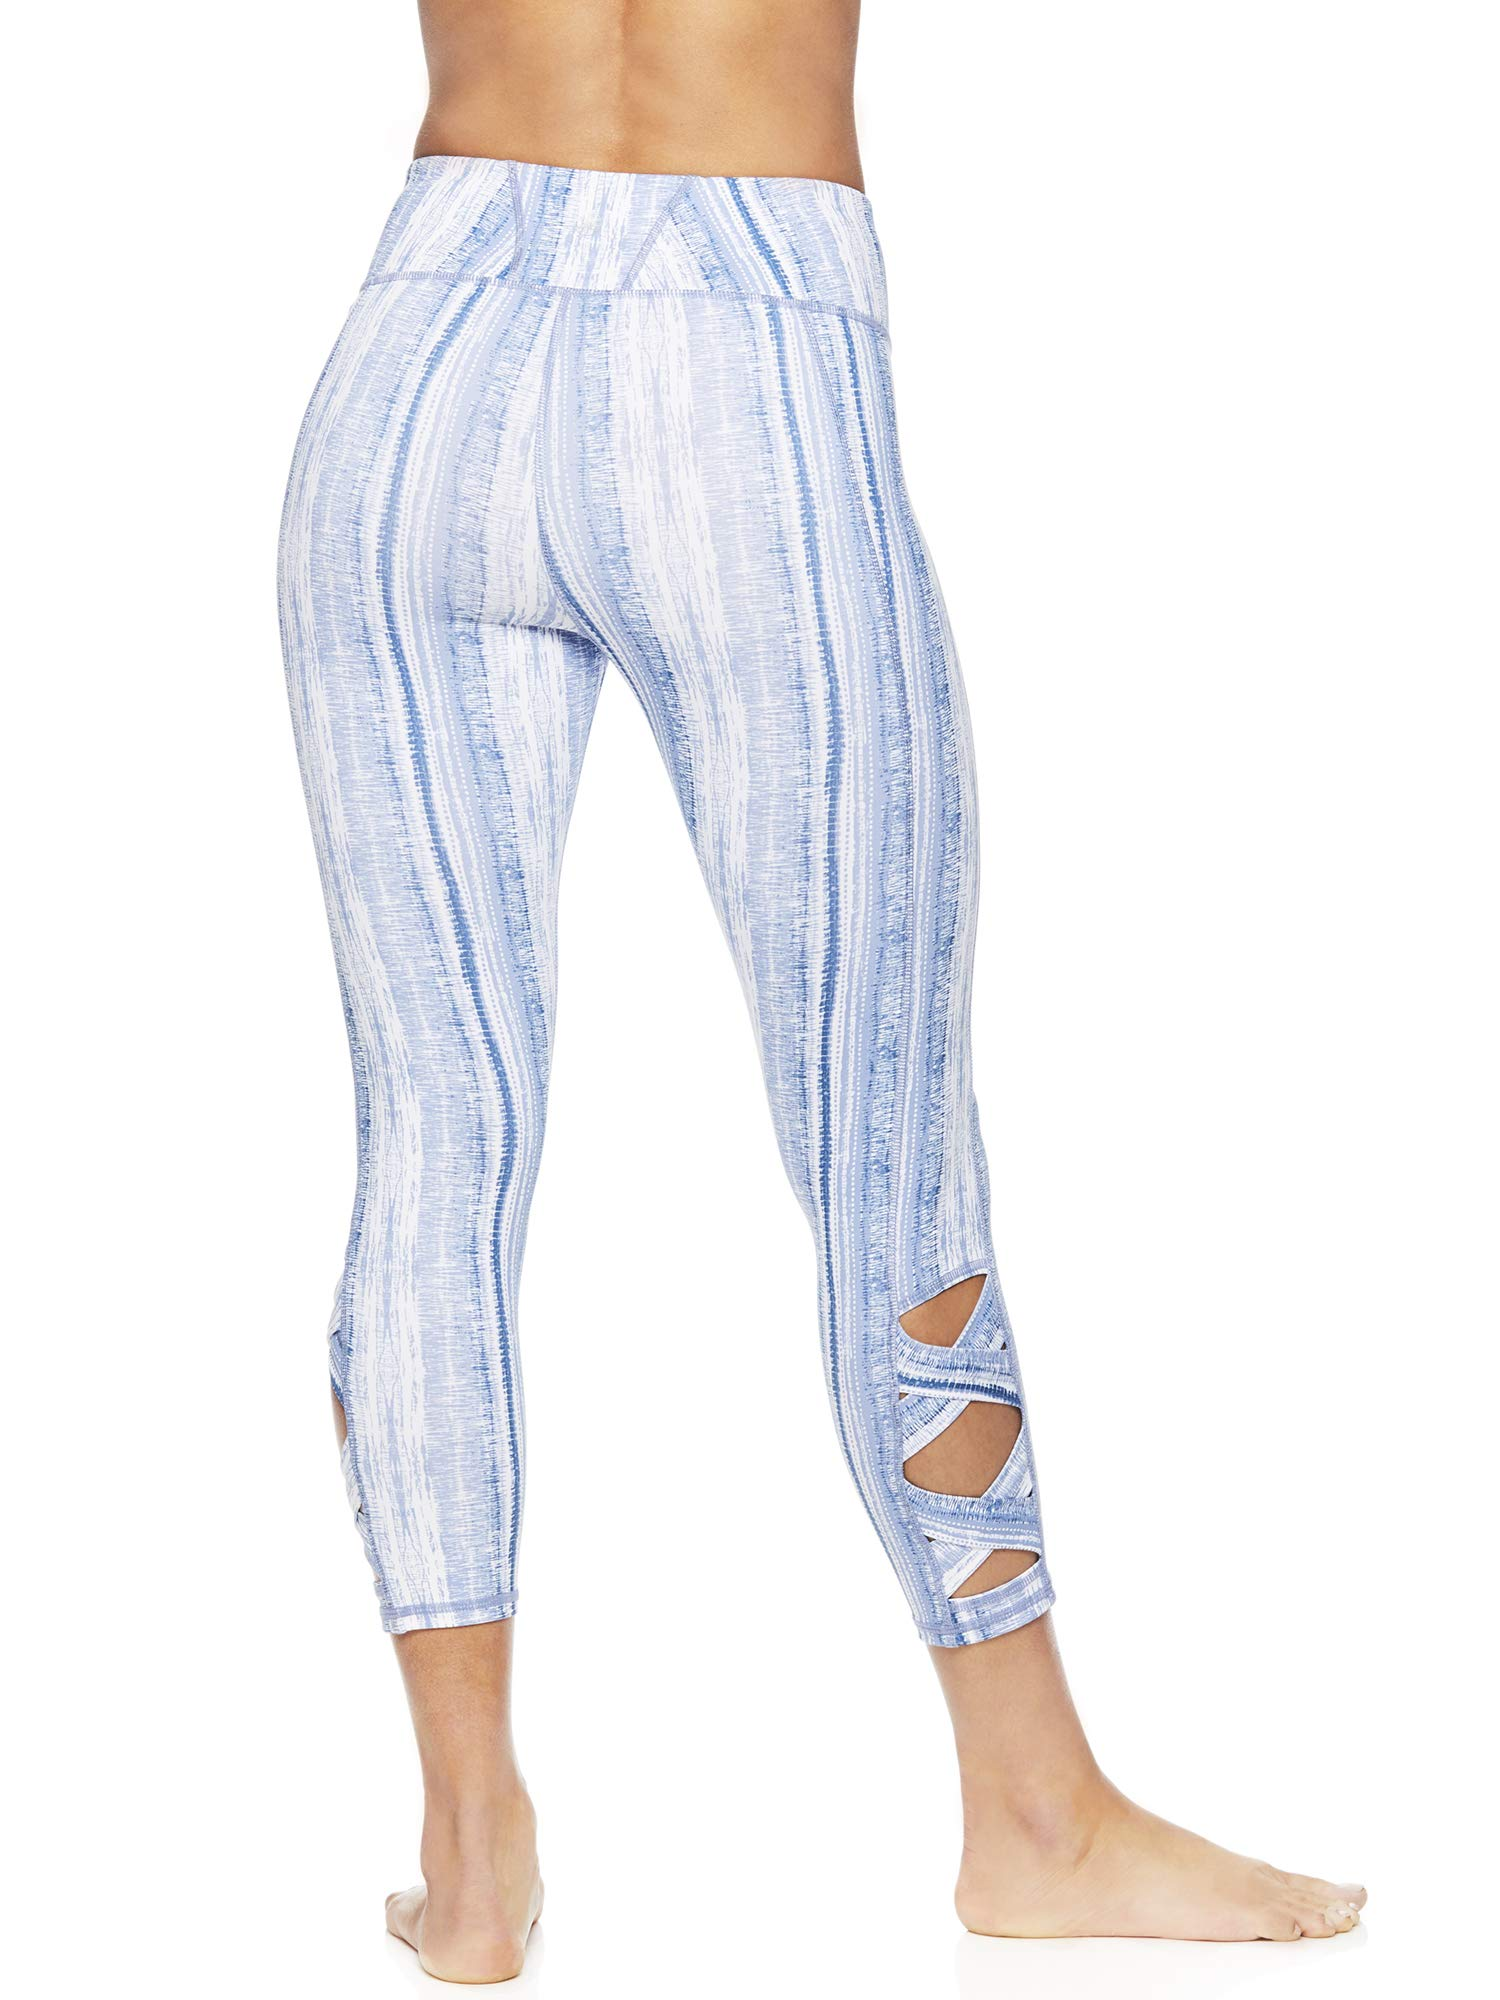 Gaiam Women's Capri Yoga Pants - Performance Spandex Compression Legging - Bright White OM Lotus White, X-Small